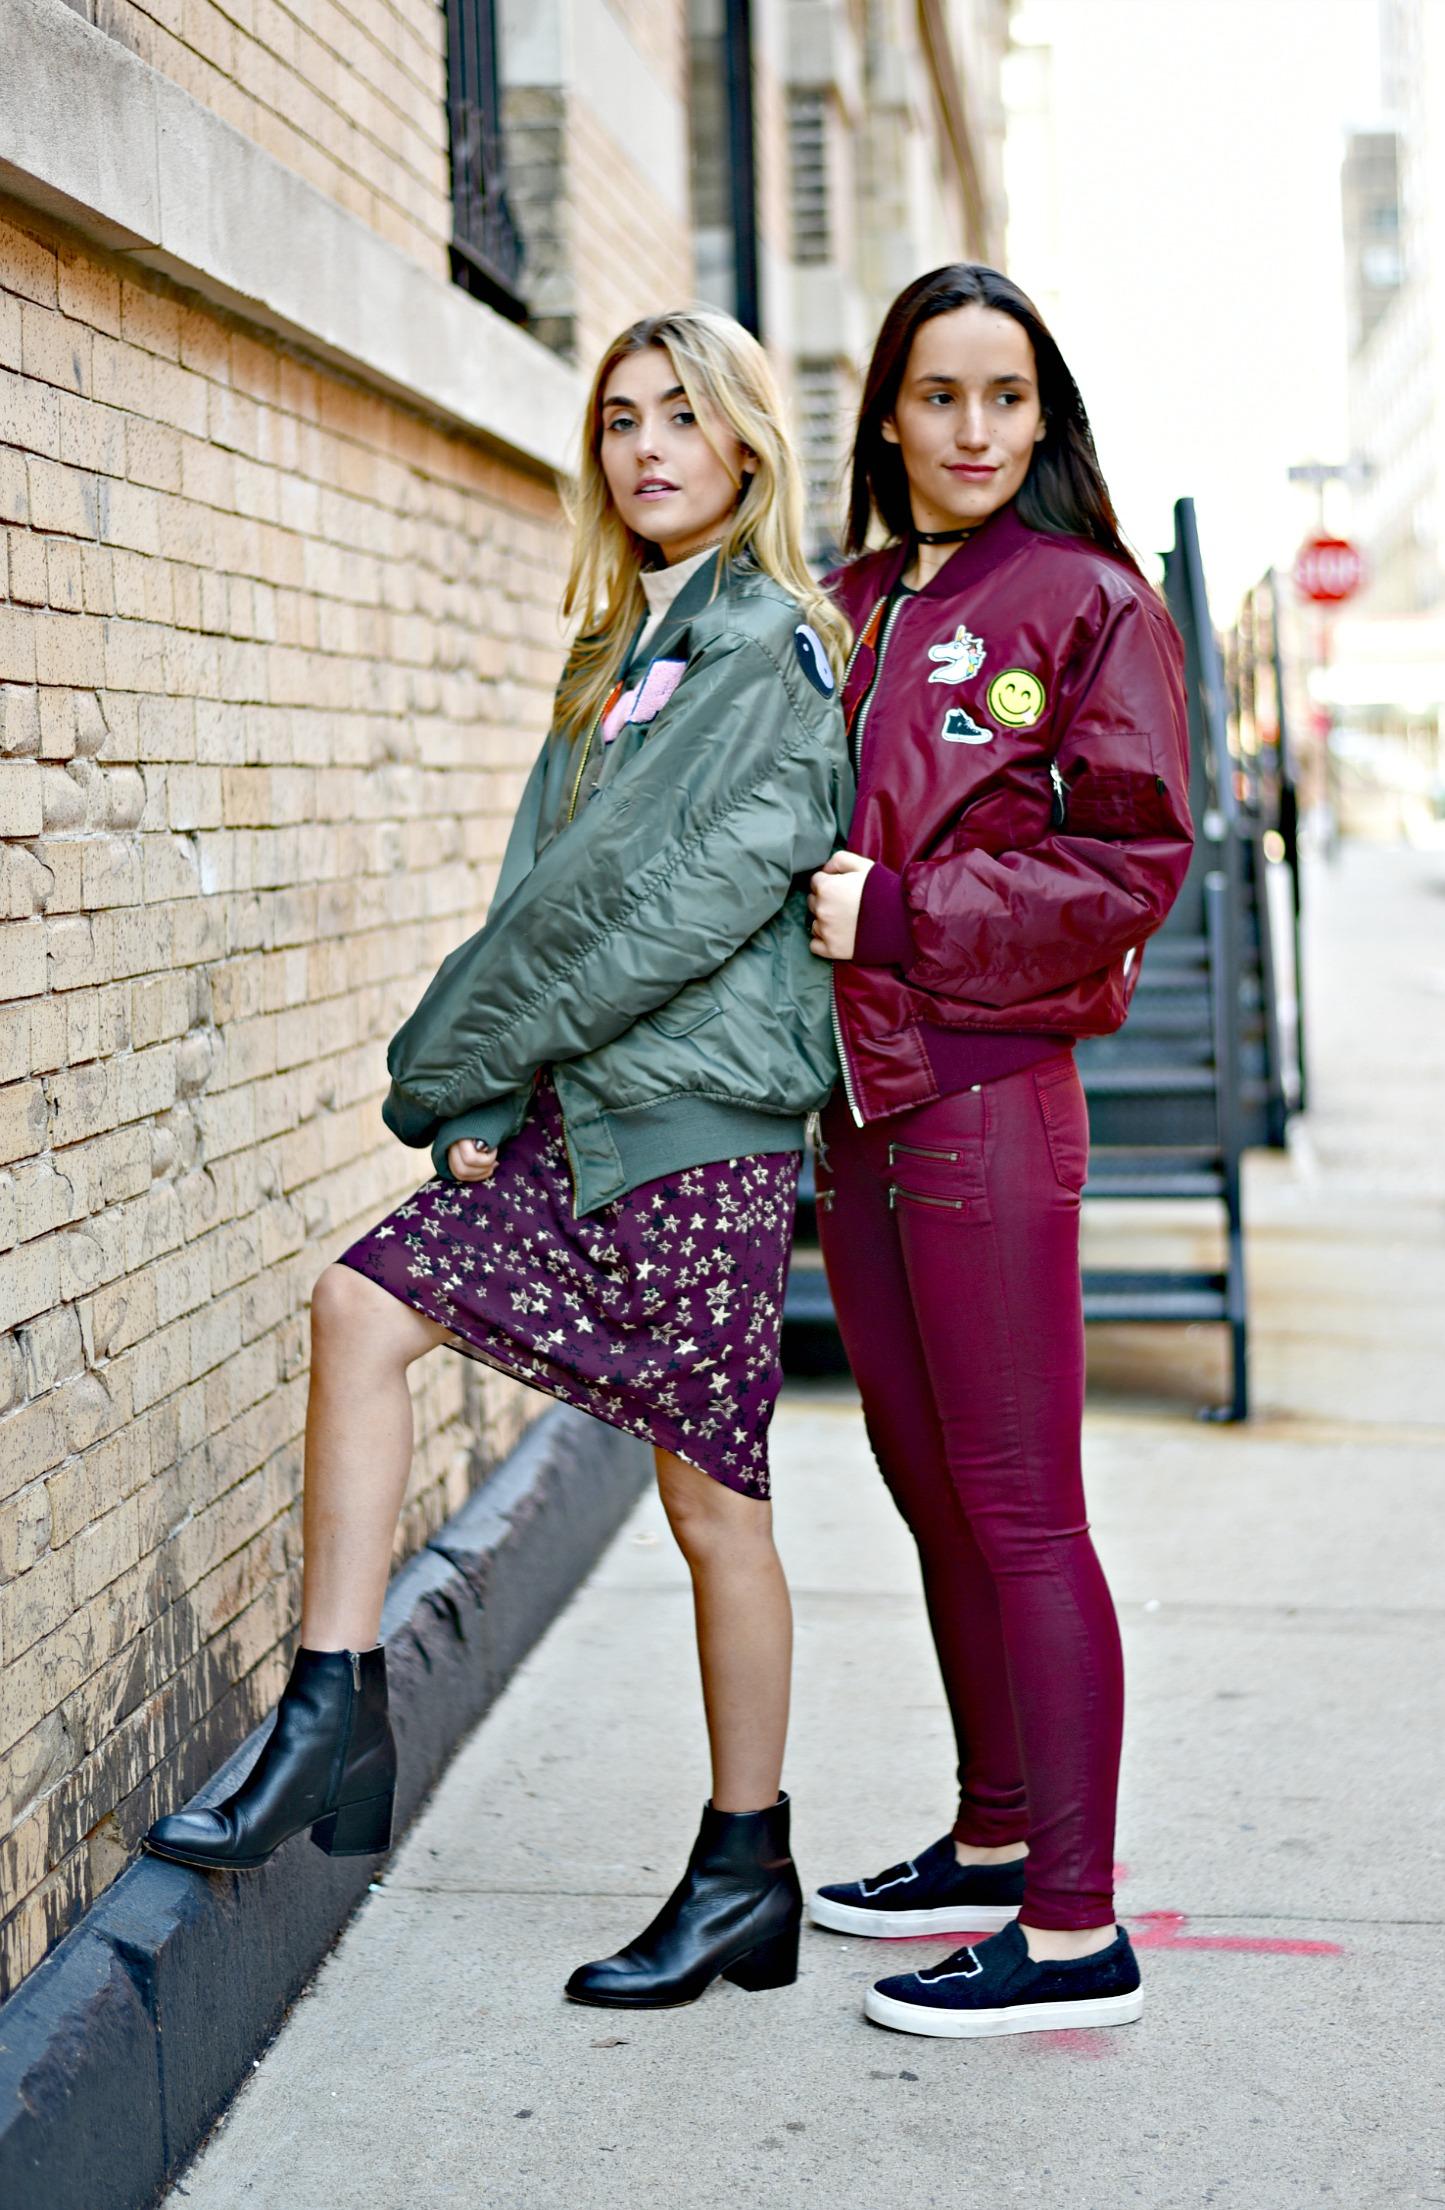 SOPHIE & CHARLOTTE BICKLEY YIN 2MY YANG SISTER FASHION BLOGGERS NYC UNEMPLOYED DENIM POST 1f.jpg